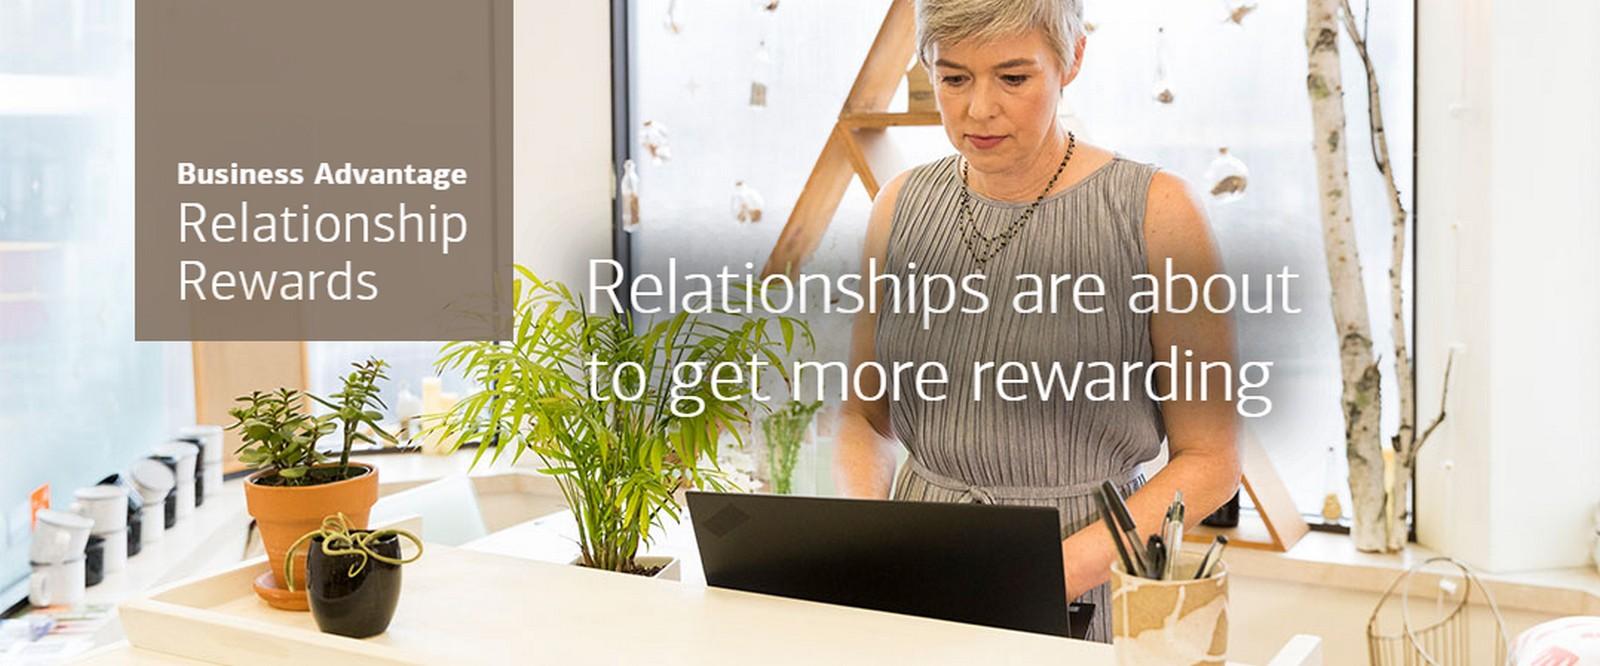 Business Advantage Relationships Rewards Program